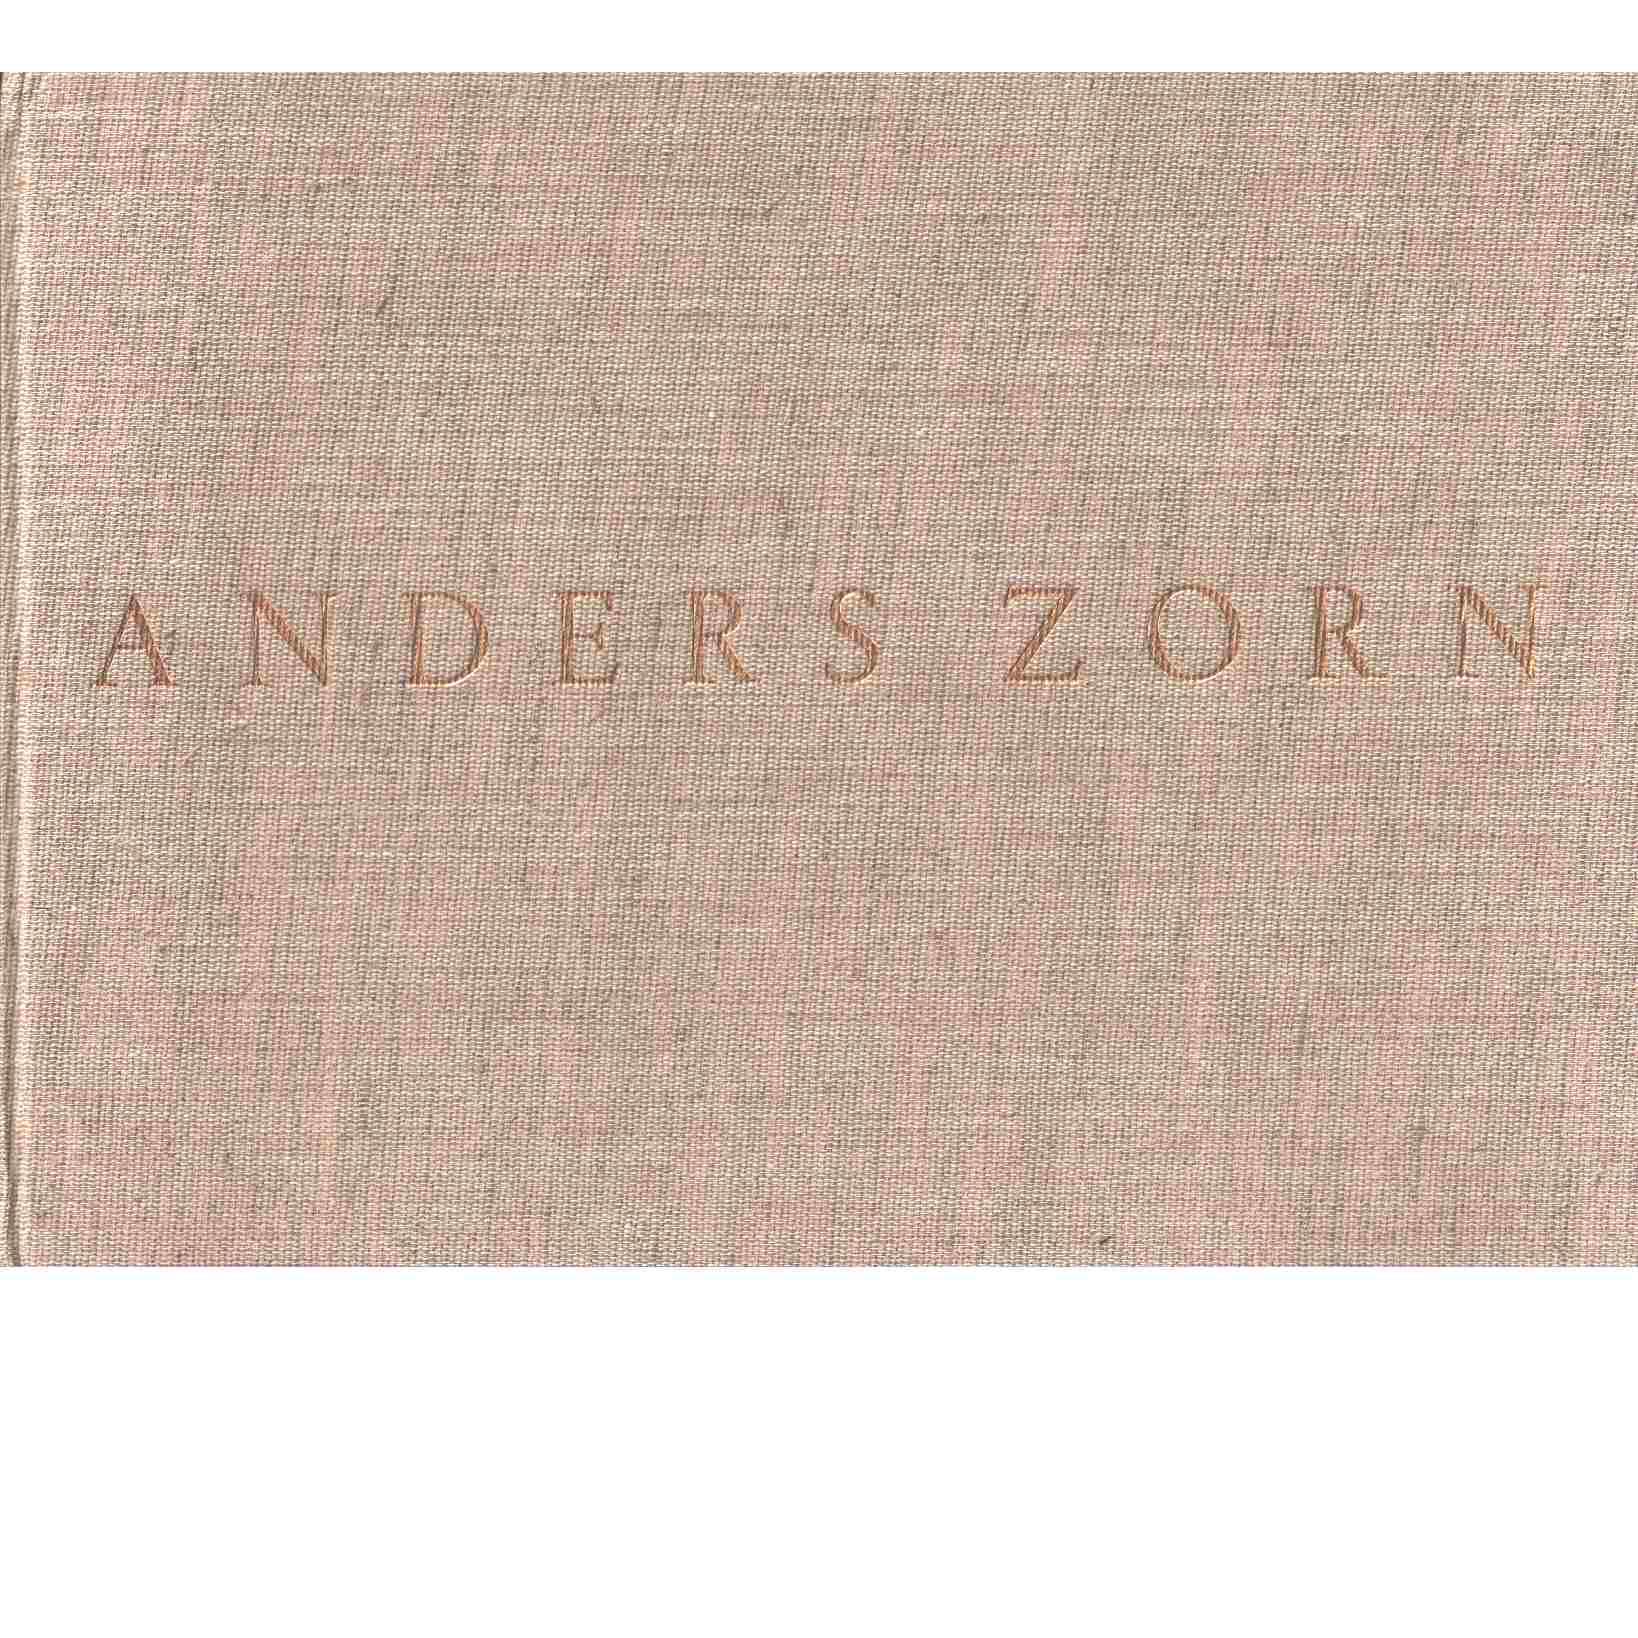 Tecknaren Anders Zorn : ett urval ur hans skissböcker - Zorn, Anders